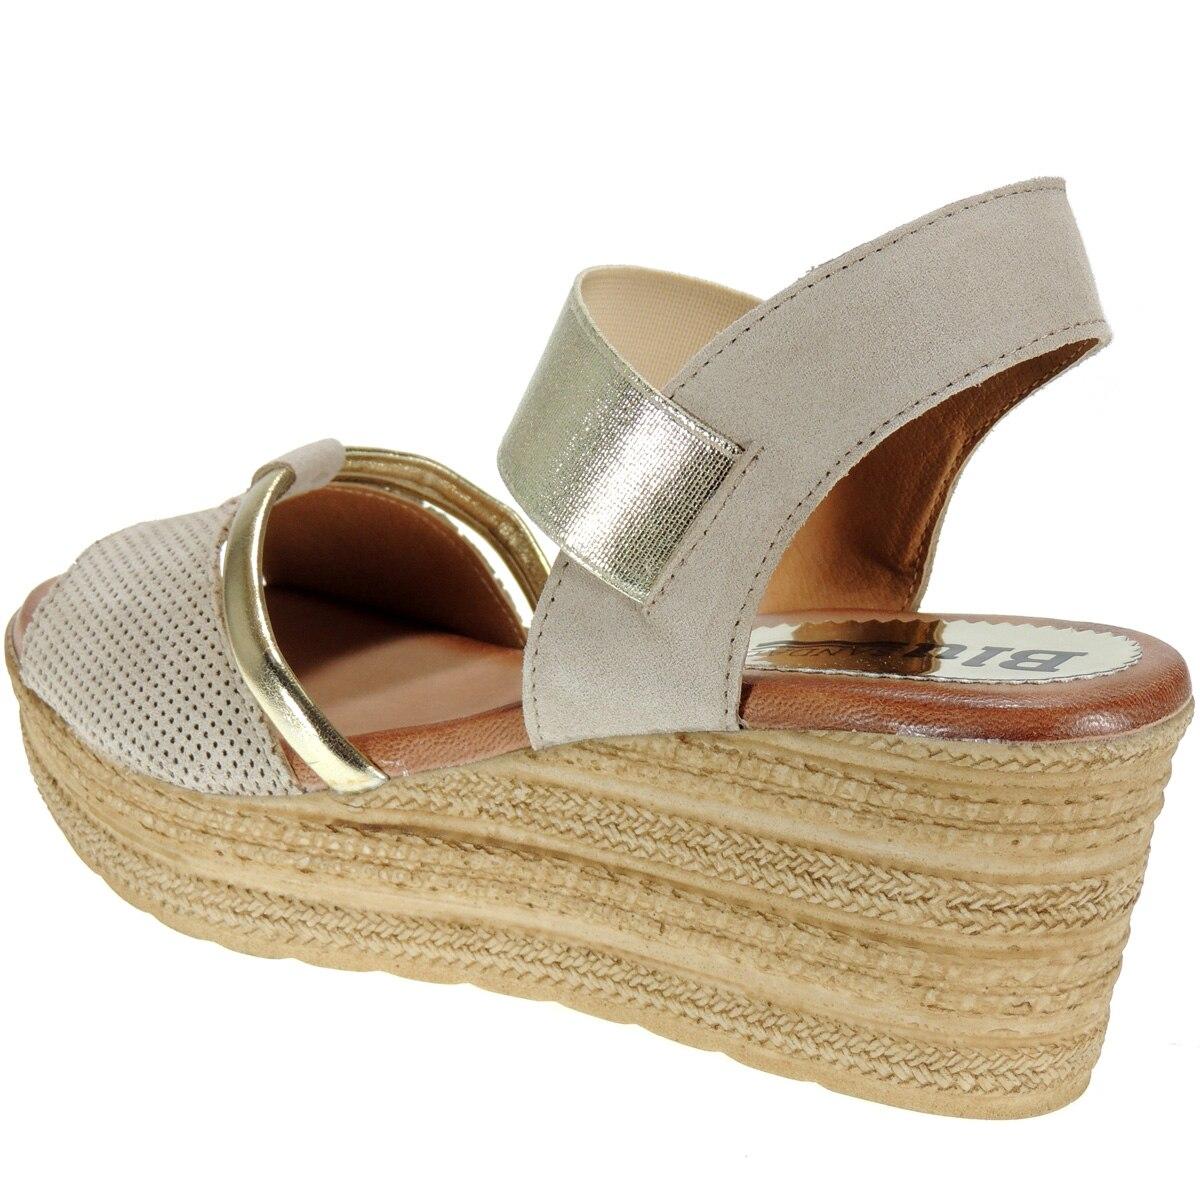 Chemisier 131 cuir sandale robe plante Gel plateforme 3Cm cale 7Cm elastique femme - 4